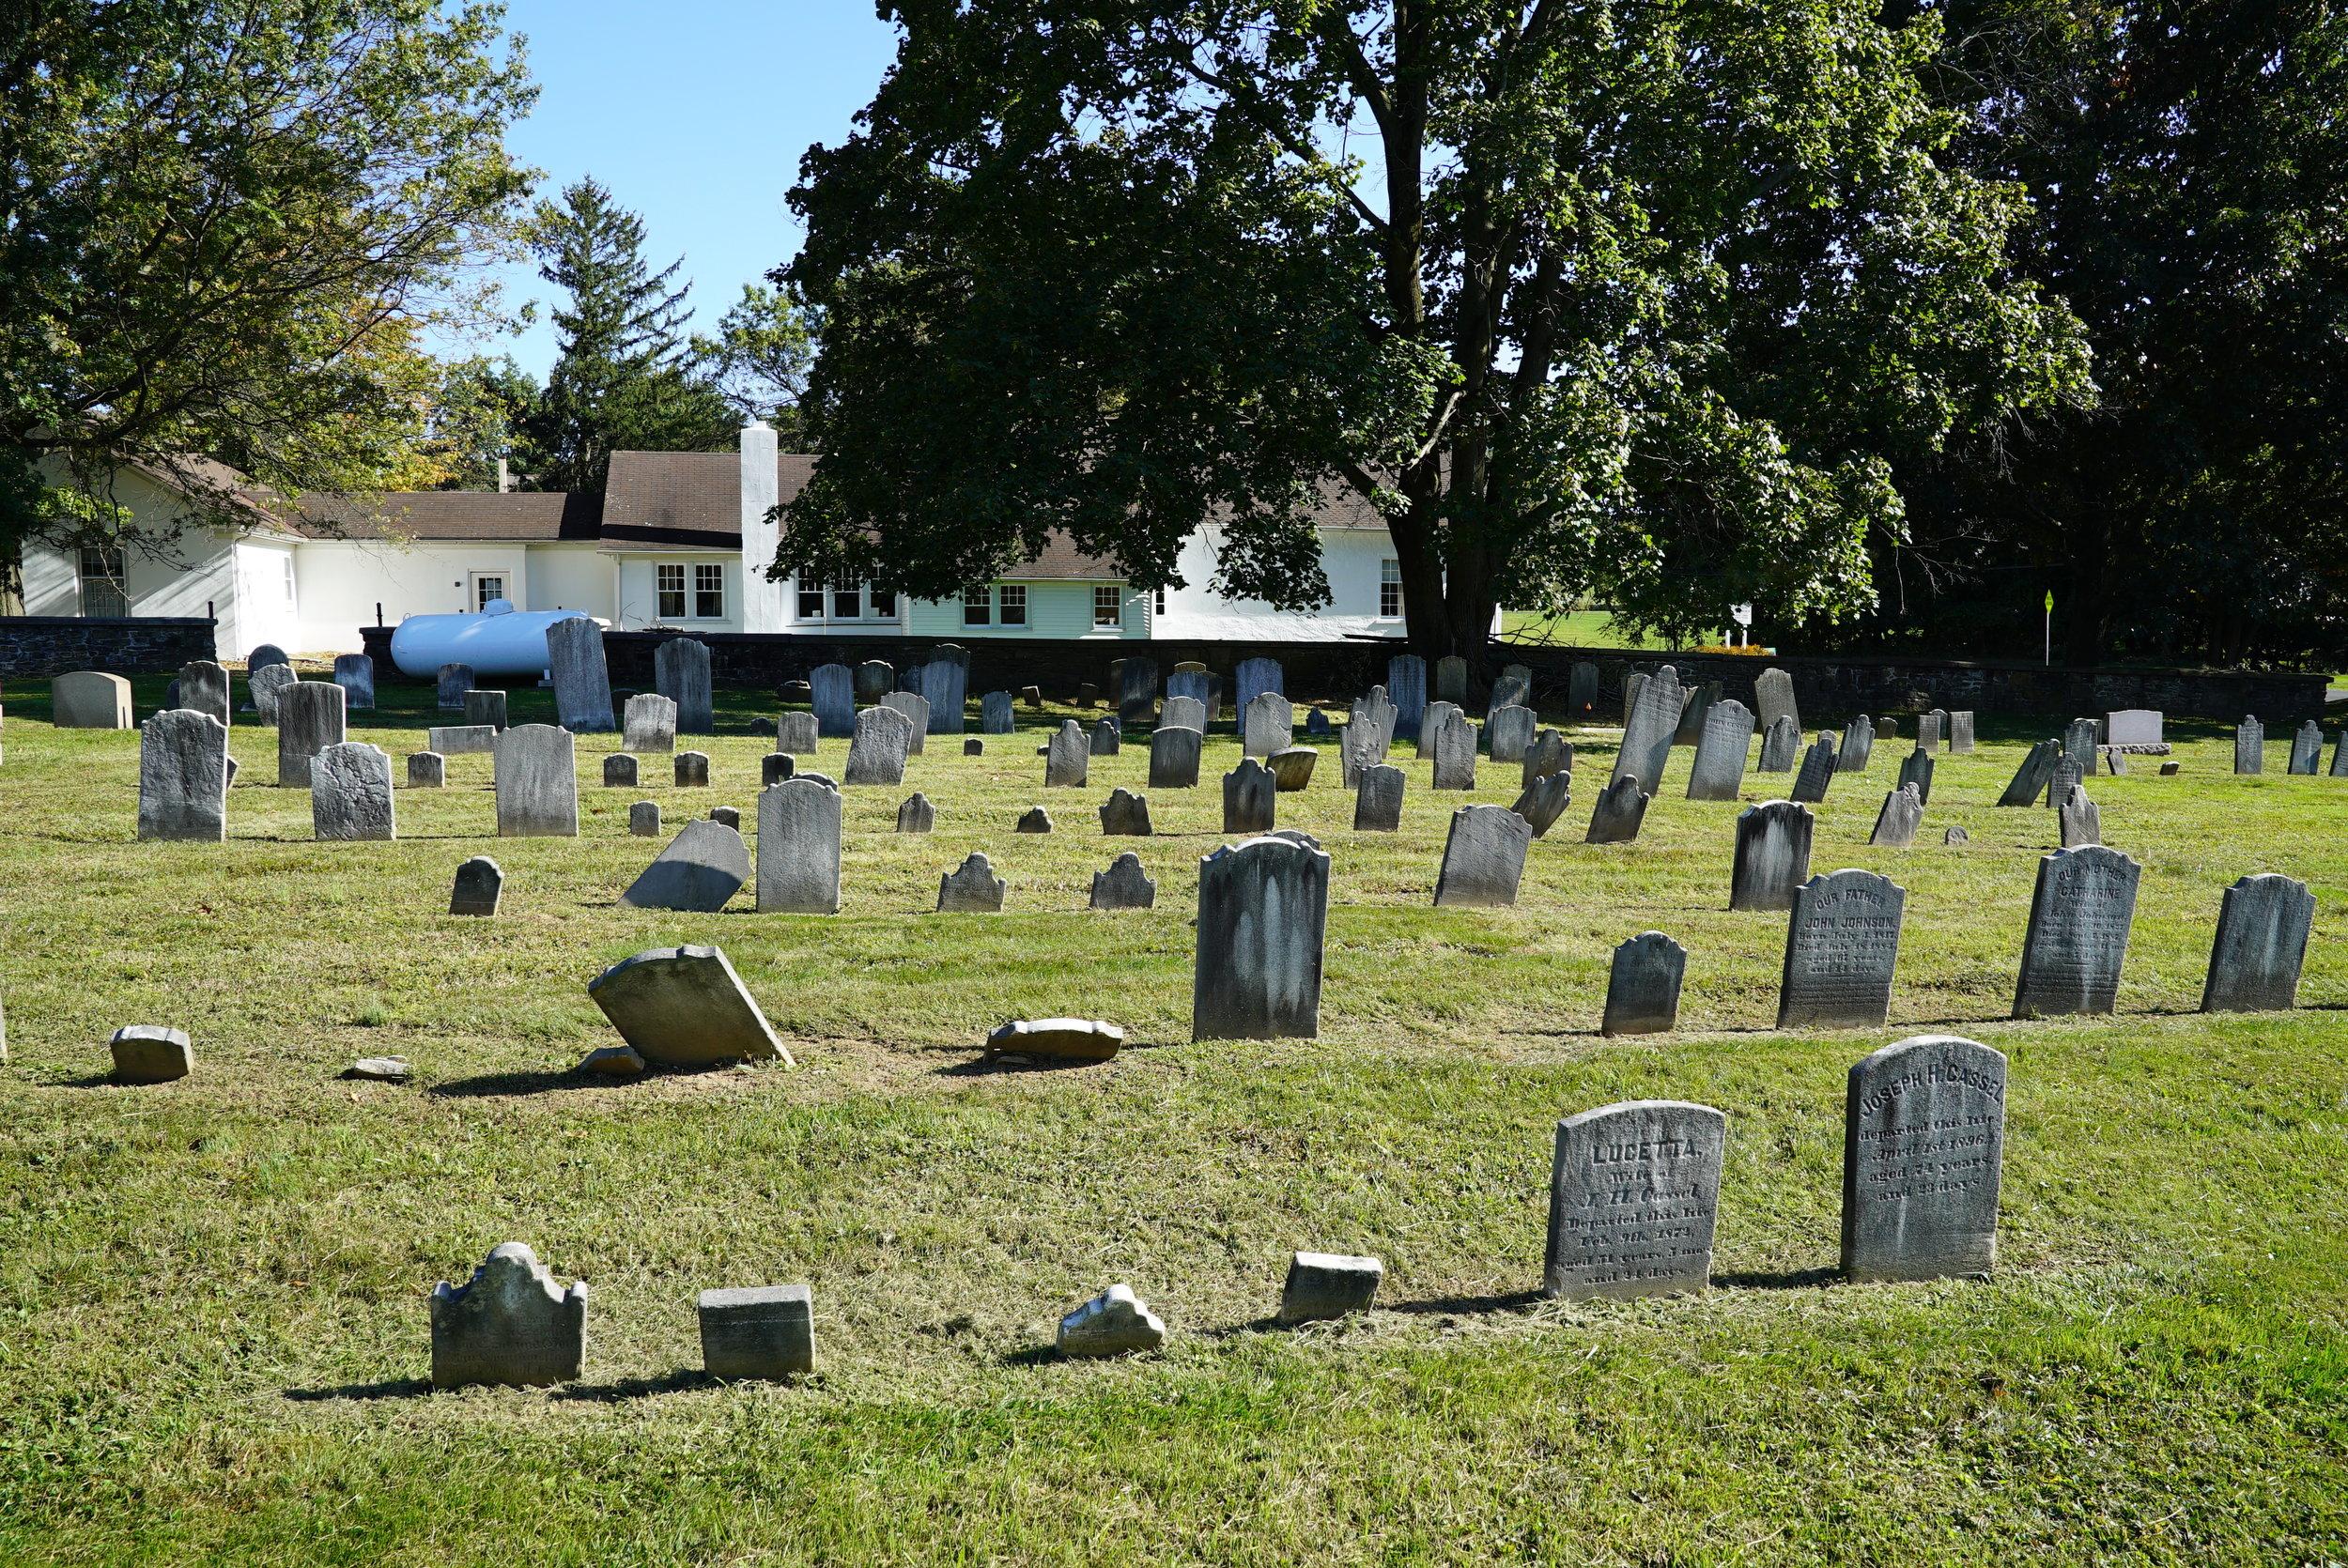 Methacton Mennonite Cemetery. Worcester Township, Montgomery County, Pennsylvania.